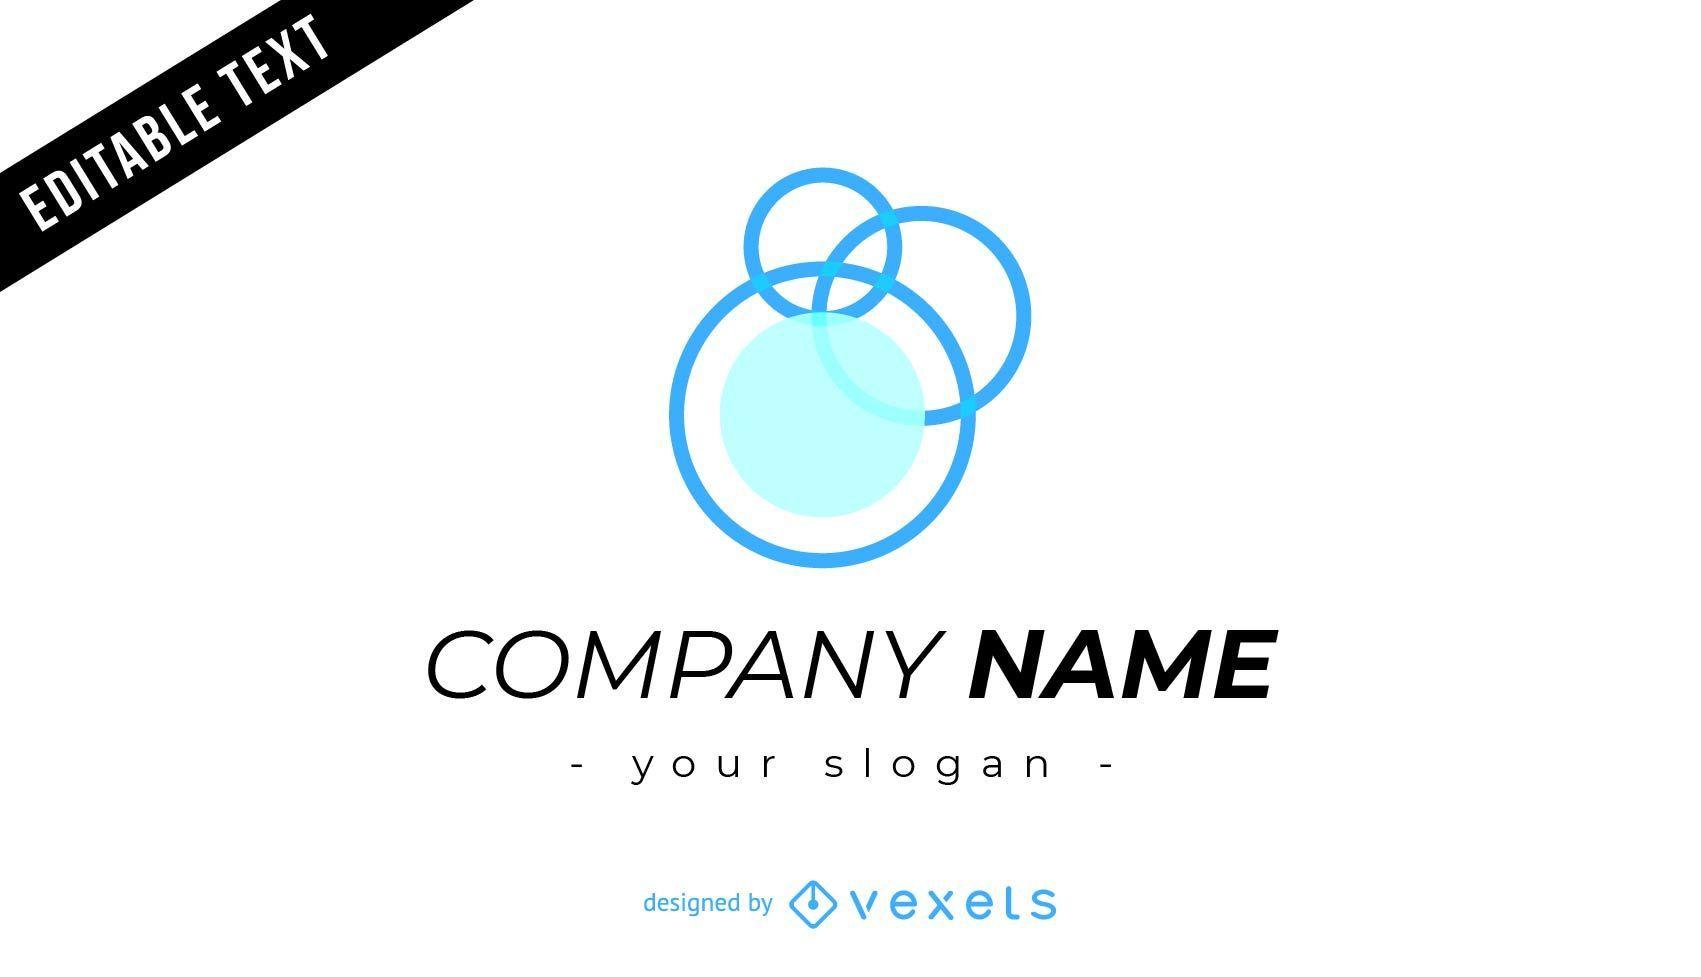 Company logo design with bubbles